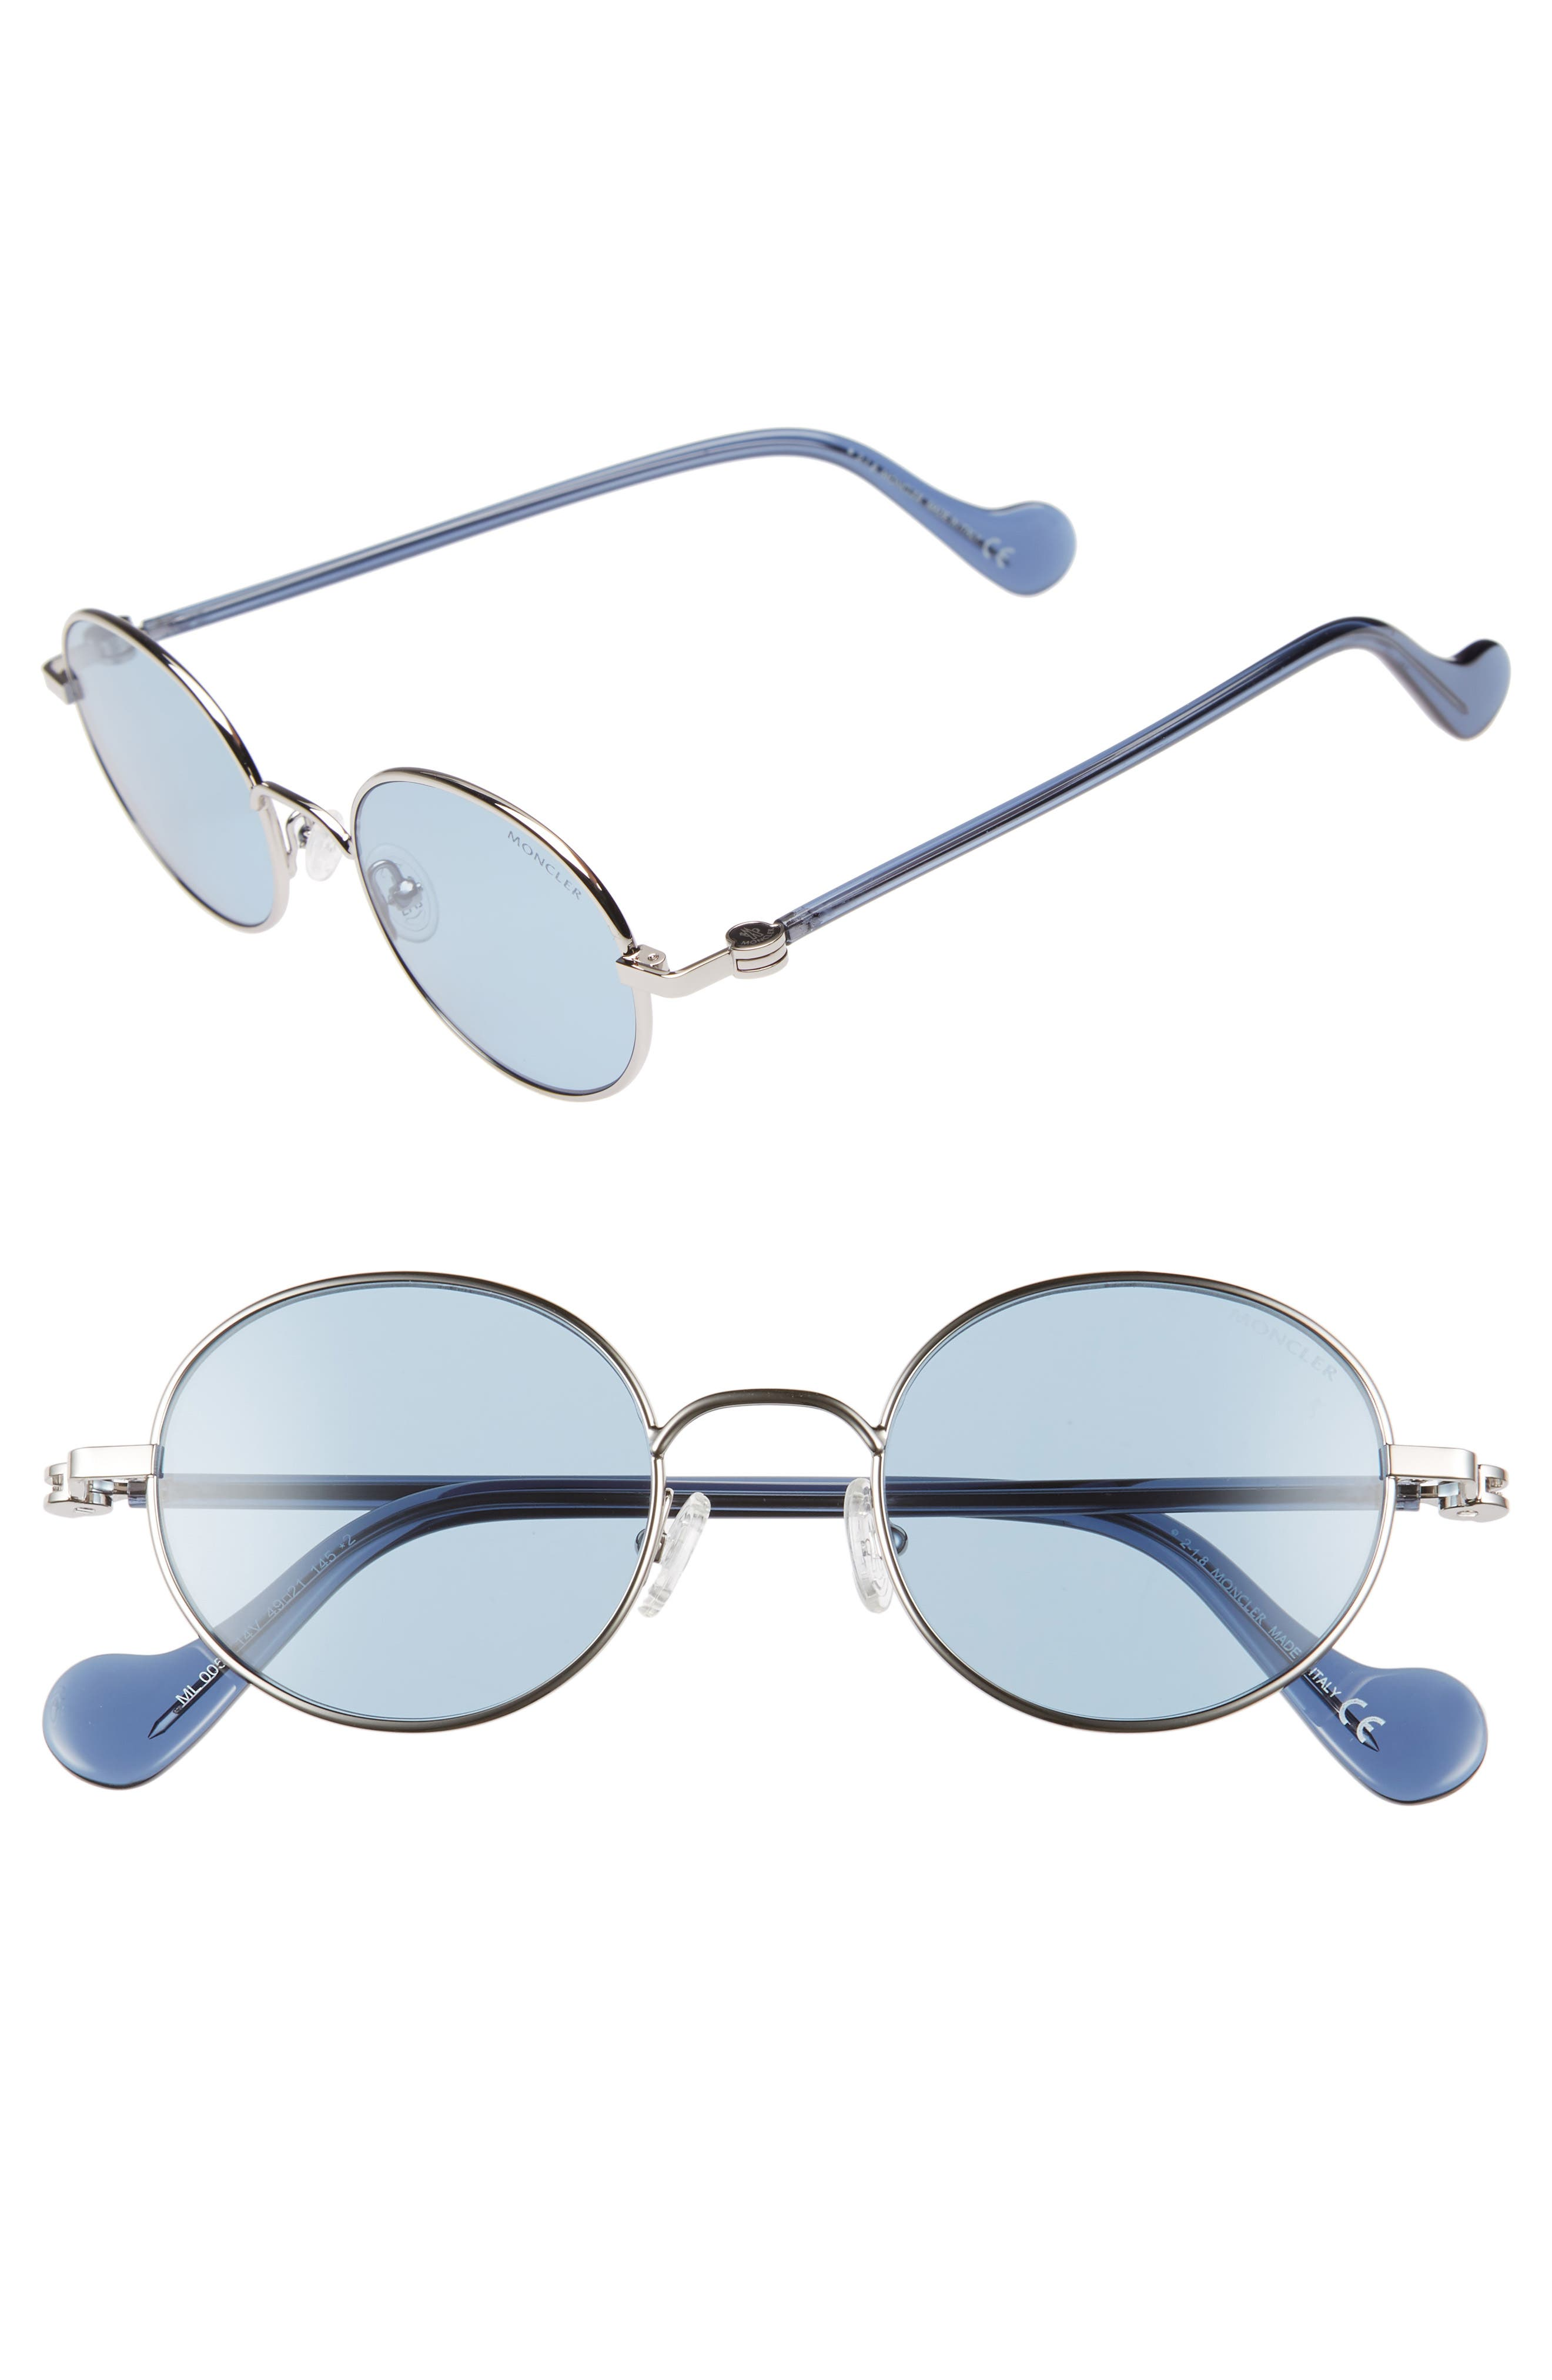 49mm Round Metal Sunglasses, Main, color, SHINY LIGHT RUTHENIUM/ BLUE